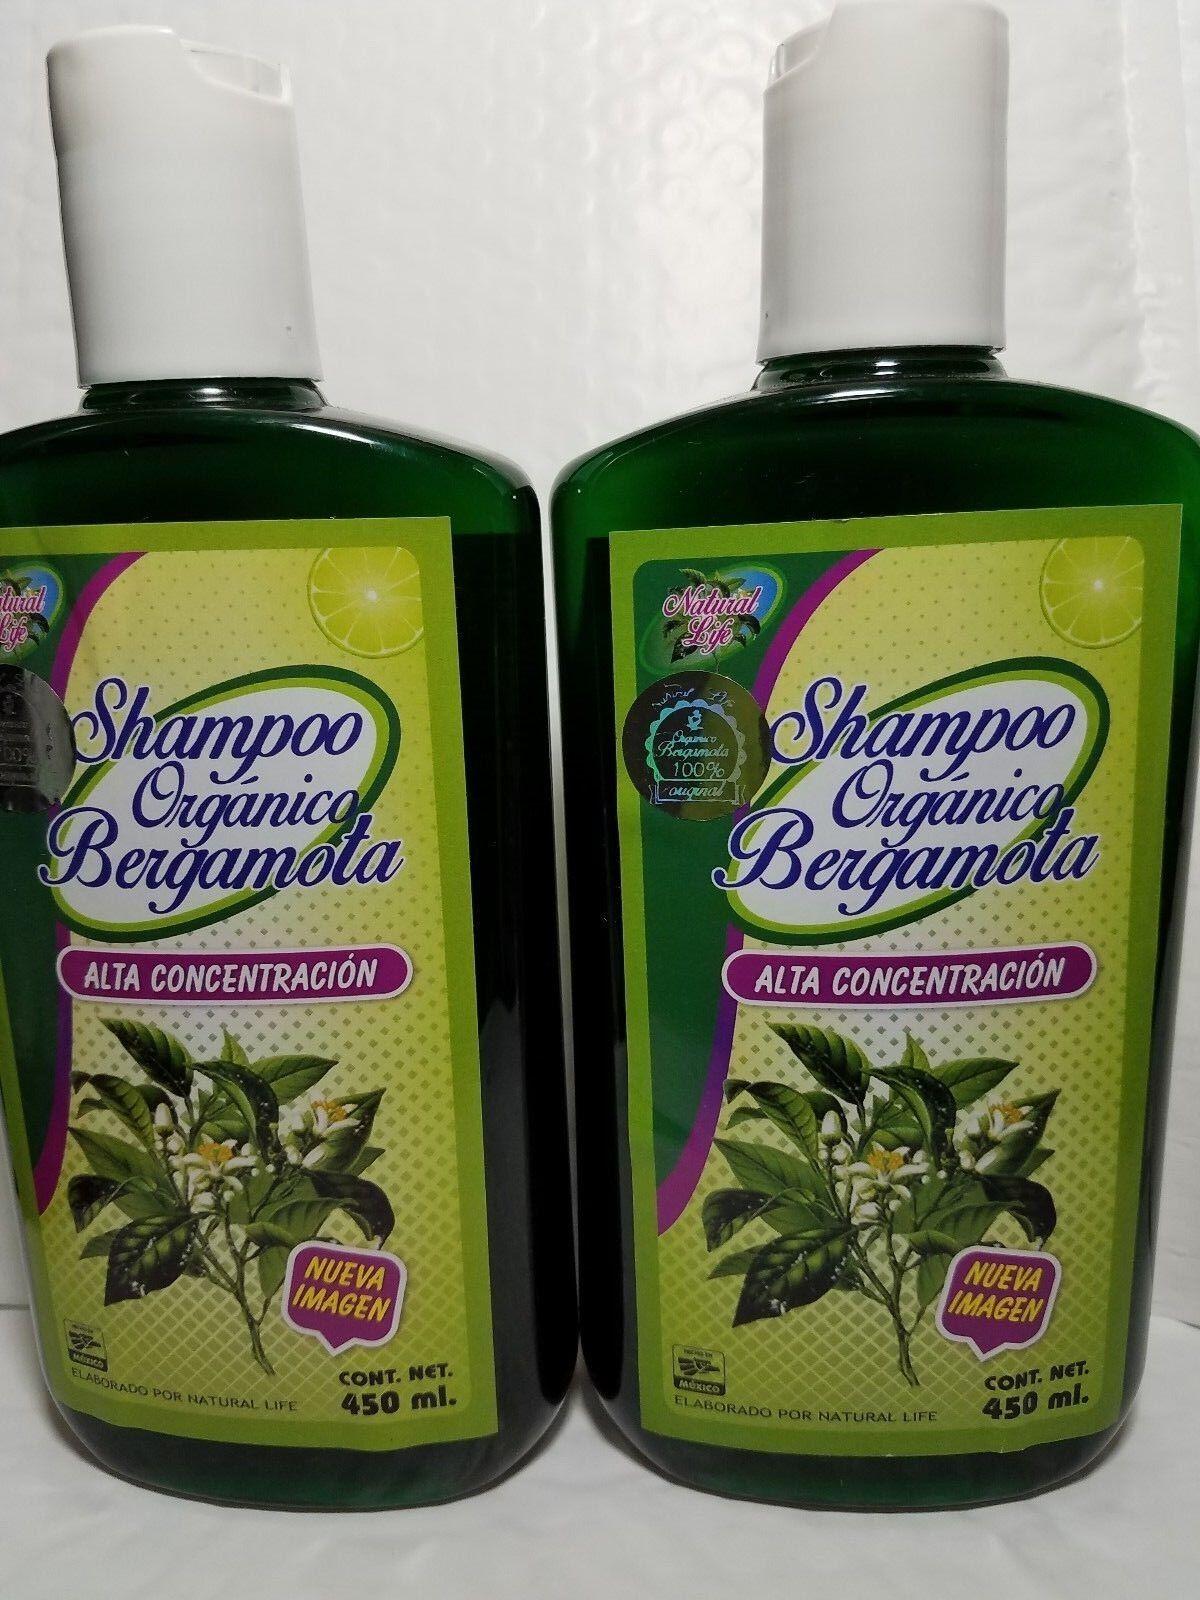 ORGANIC BERGAMOT SHAMPOO 100% NATURAL SHAMPOO DE BERGAMOTA O